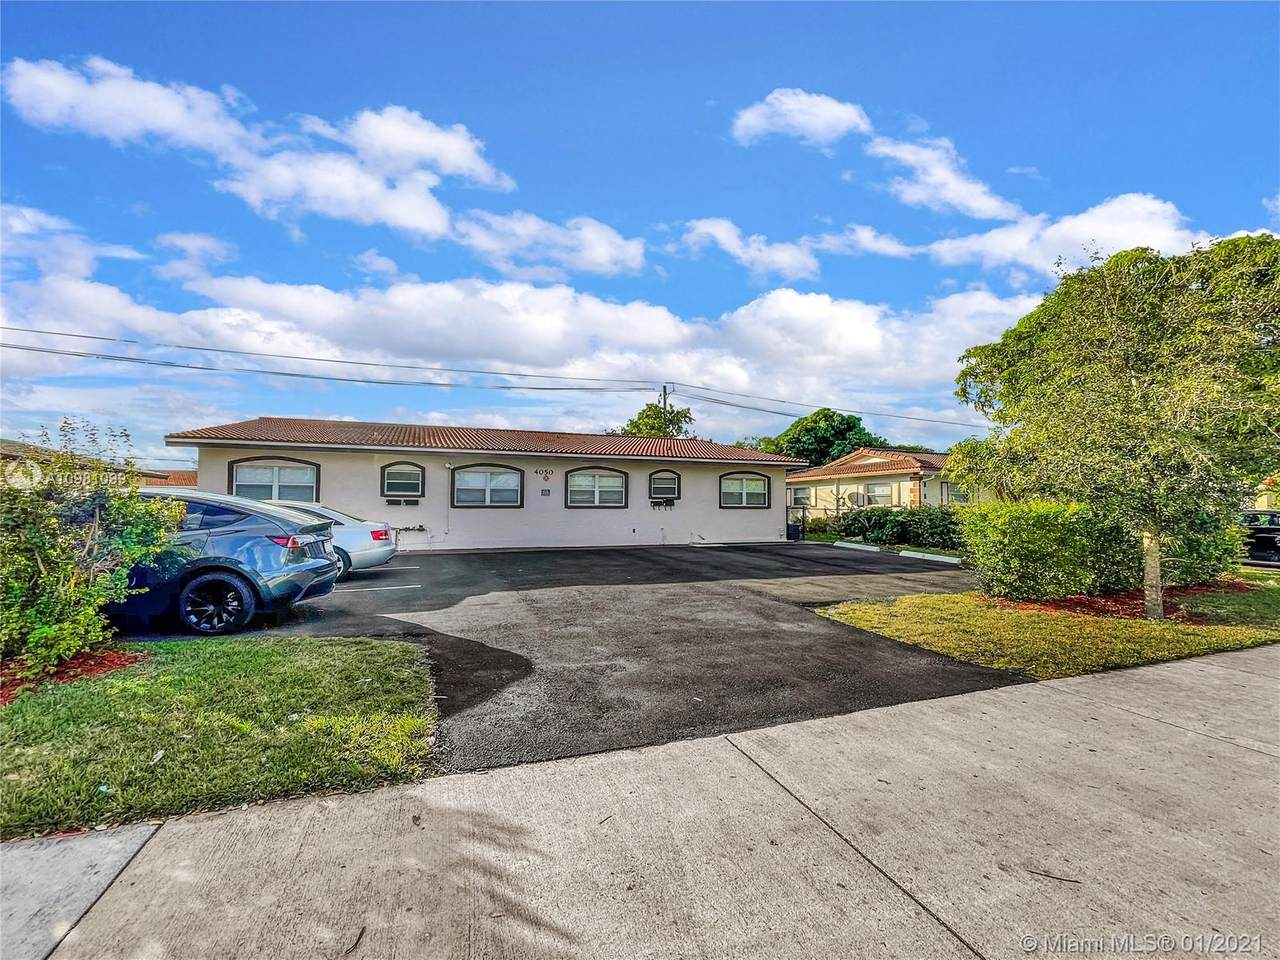 4050 Woodside Dr - Photo 1